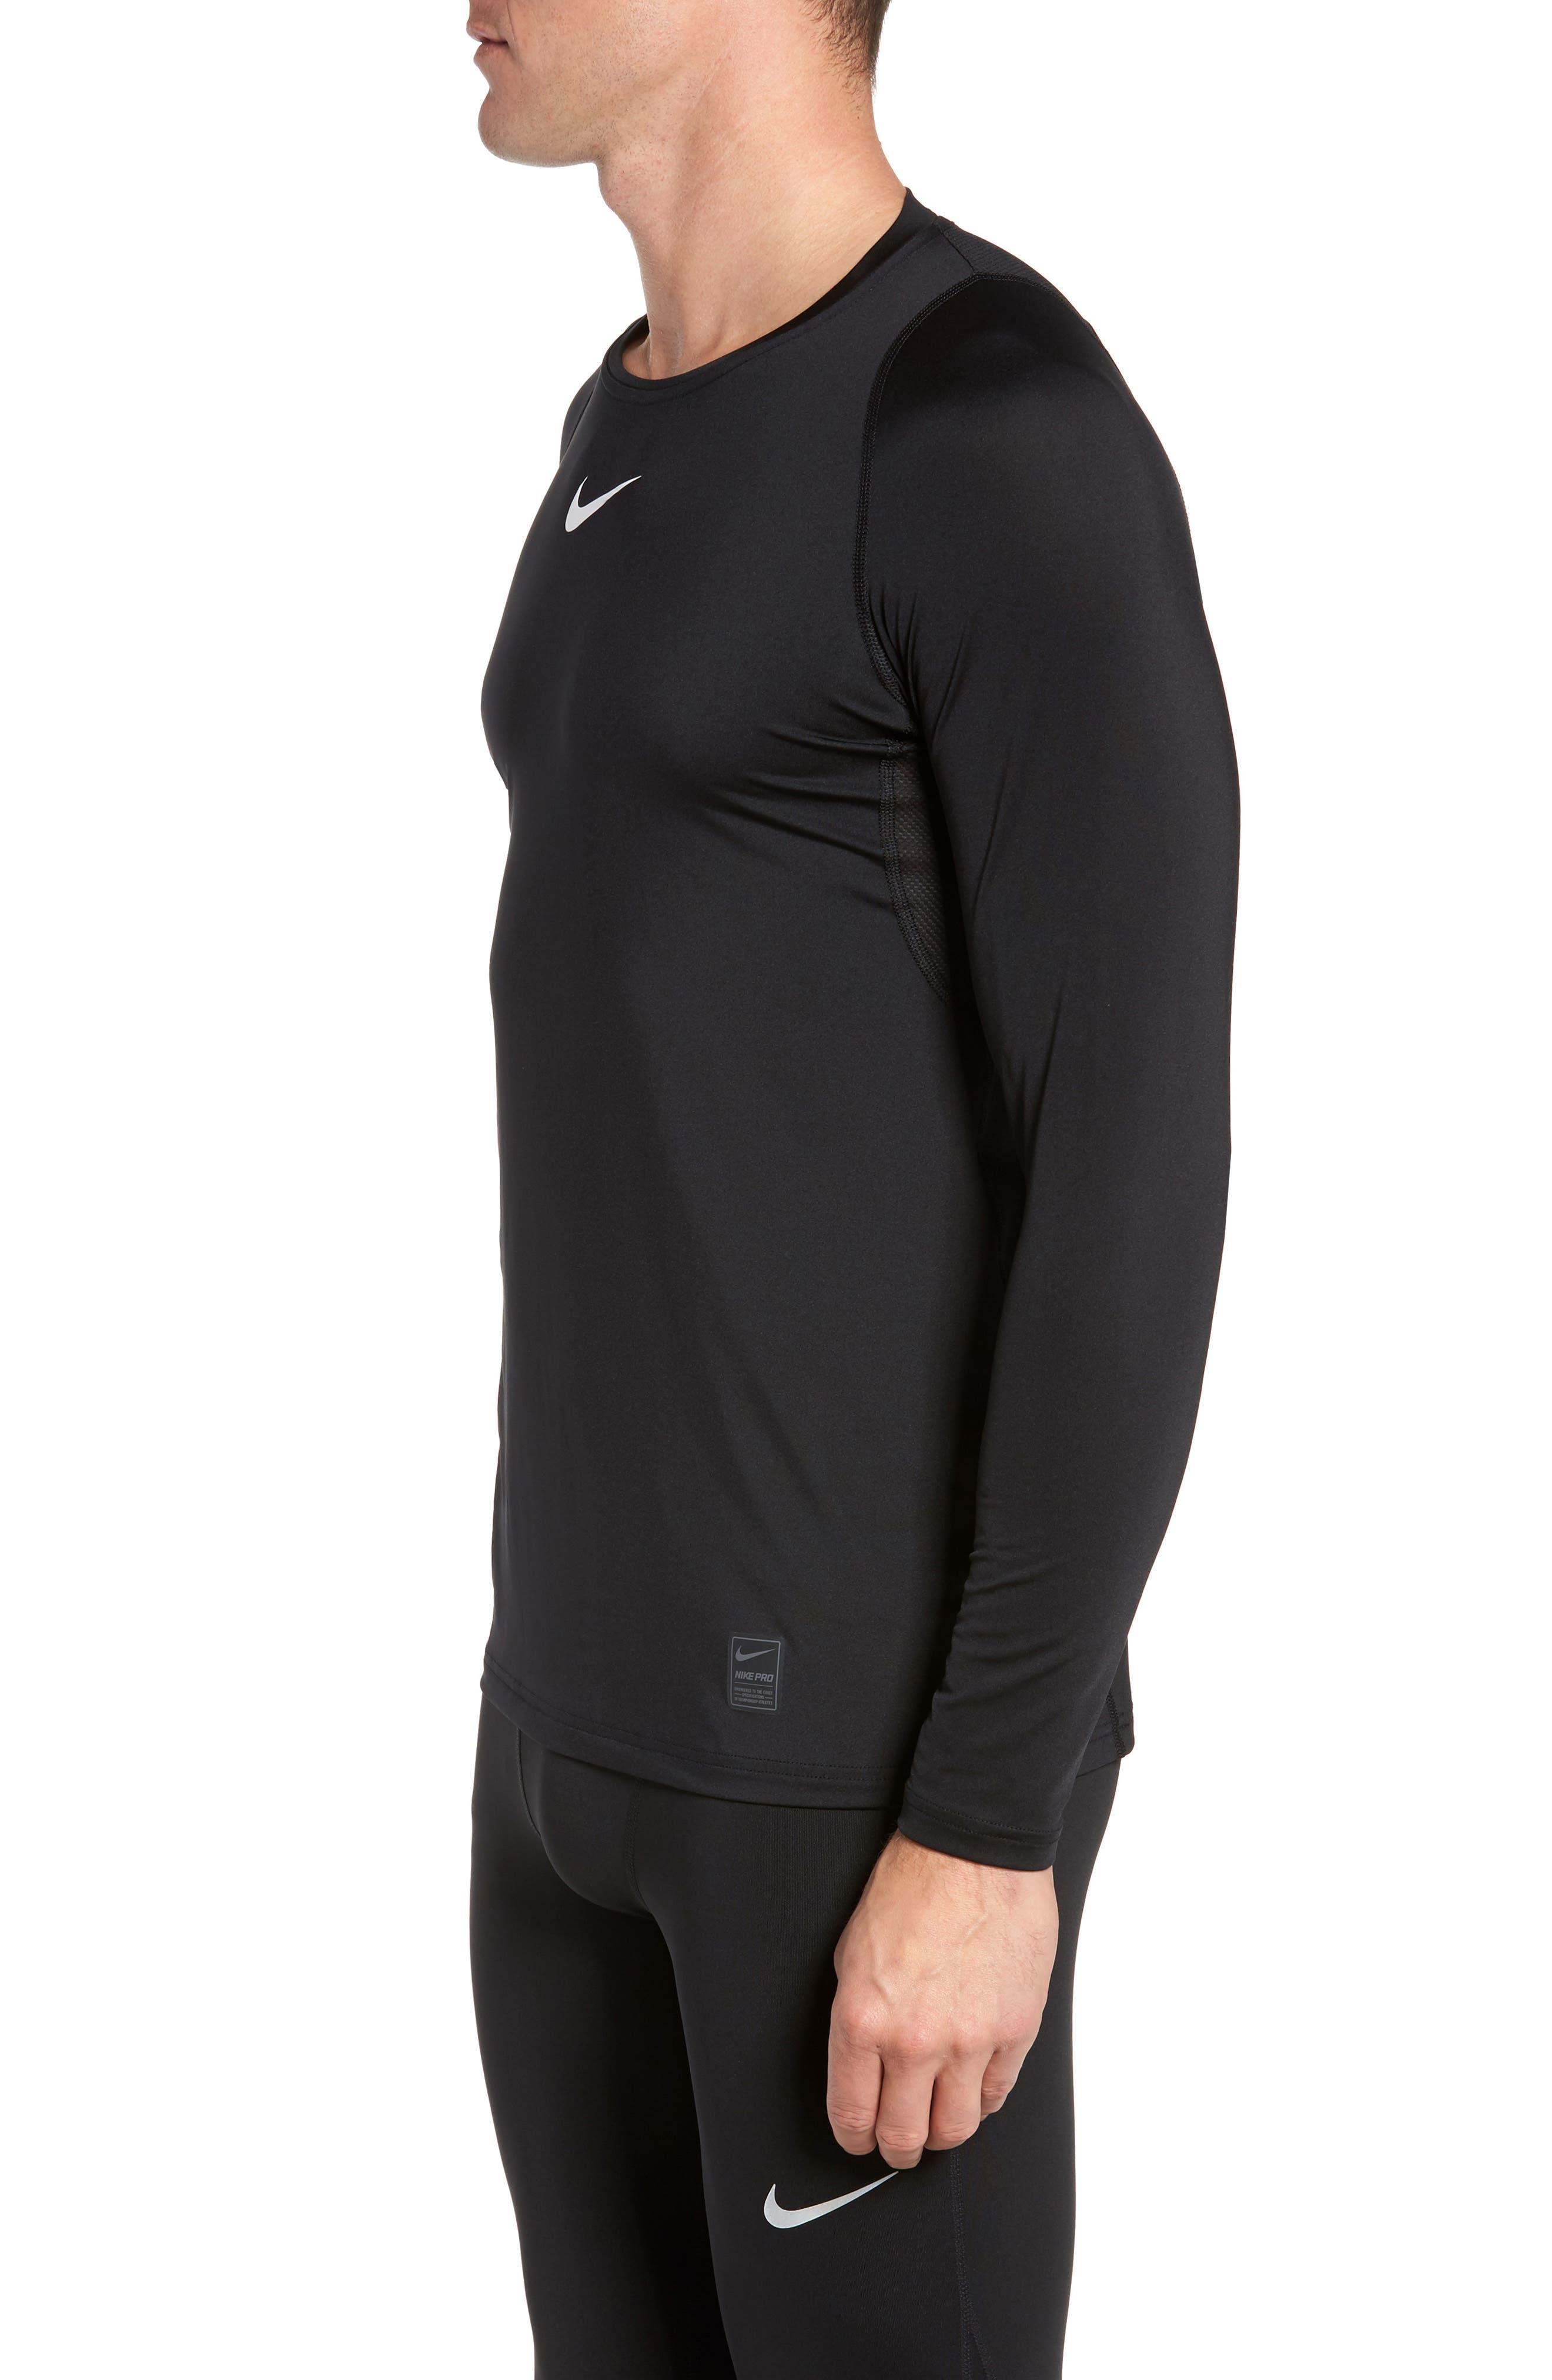 Pro Fitted Performance T-Shirt,                             Alternate thumbnail 3, color,                             BLACK/ WHITE/ WHITE